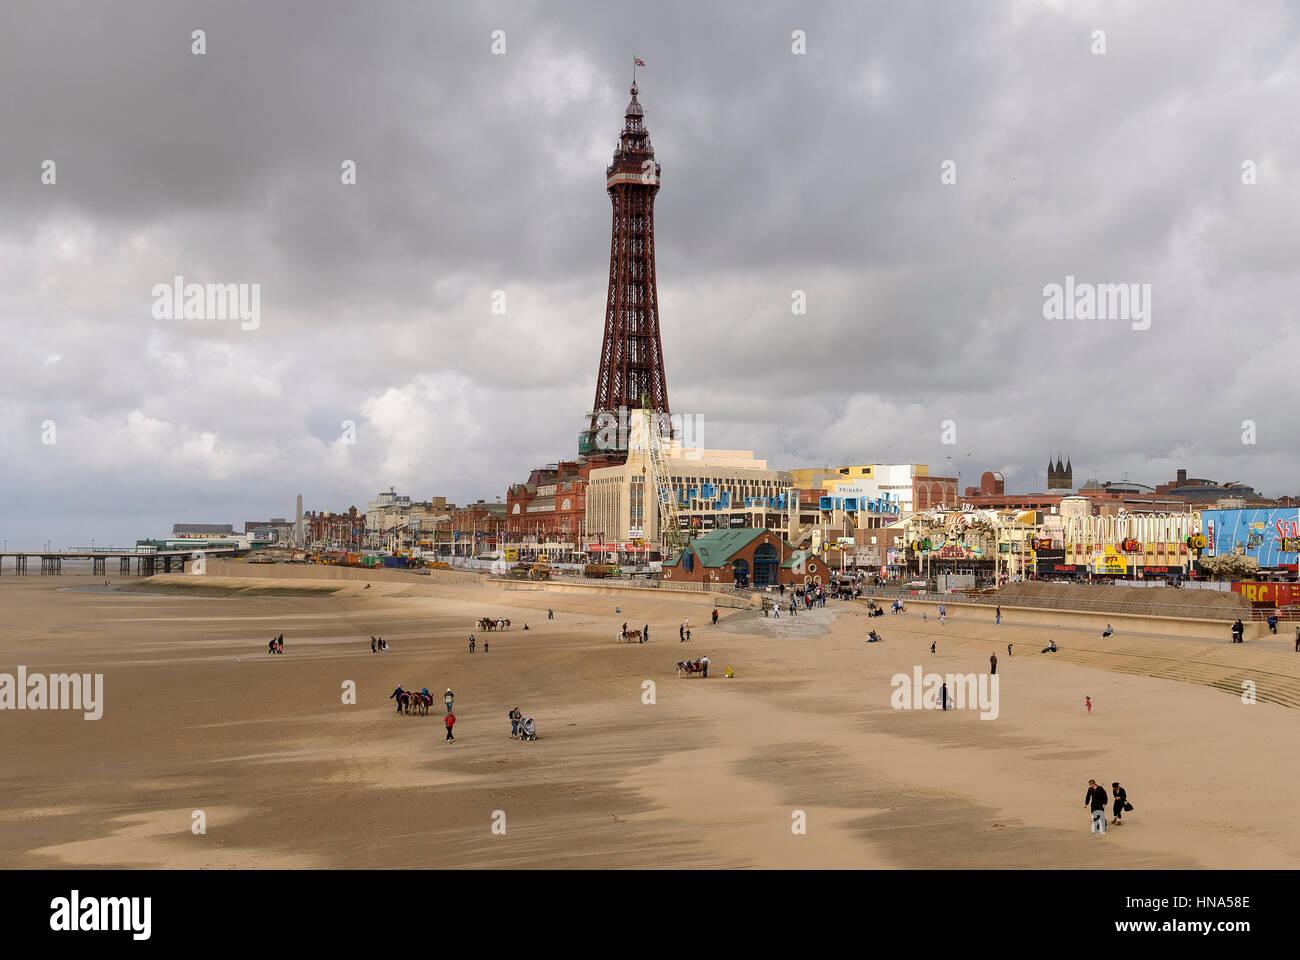 Blackpool tower onad Golden Mile beach. Lancashire. - Stock Image